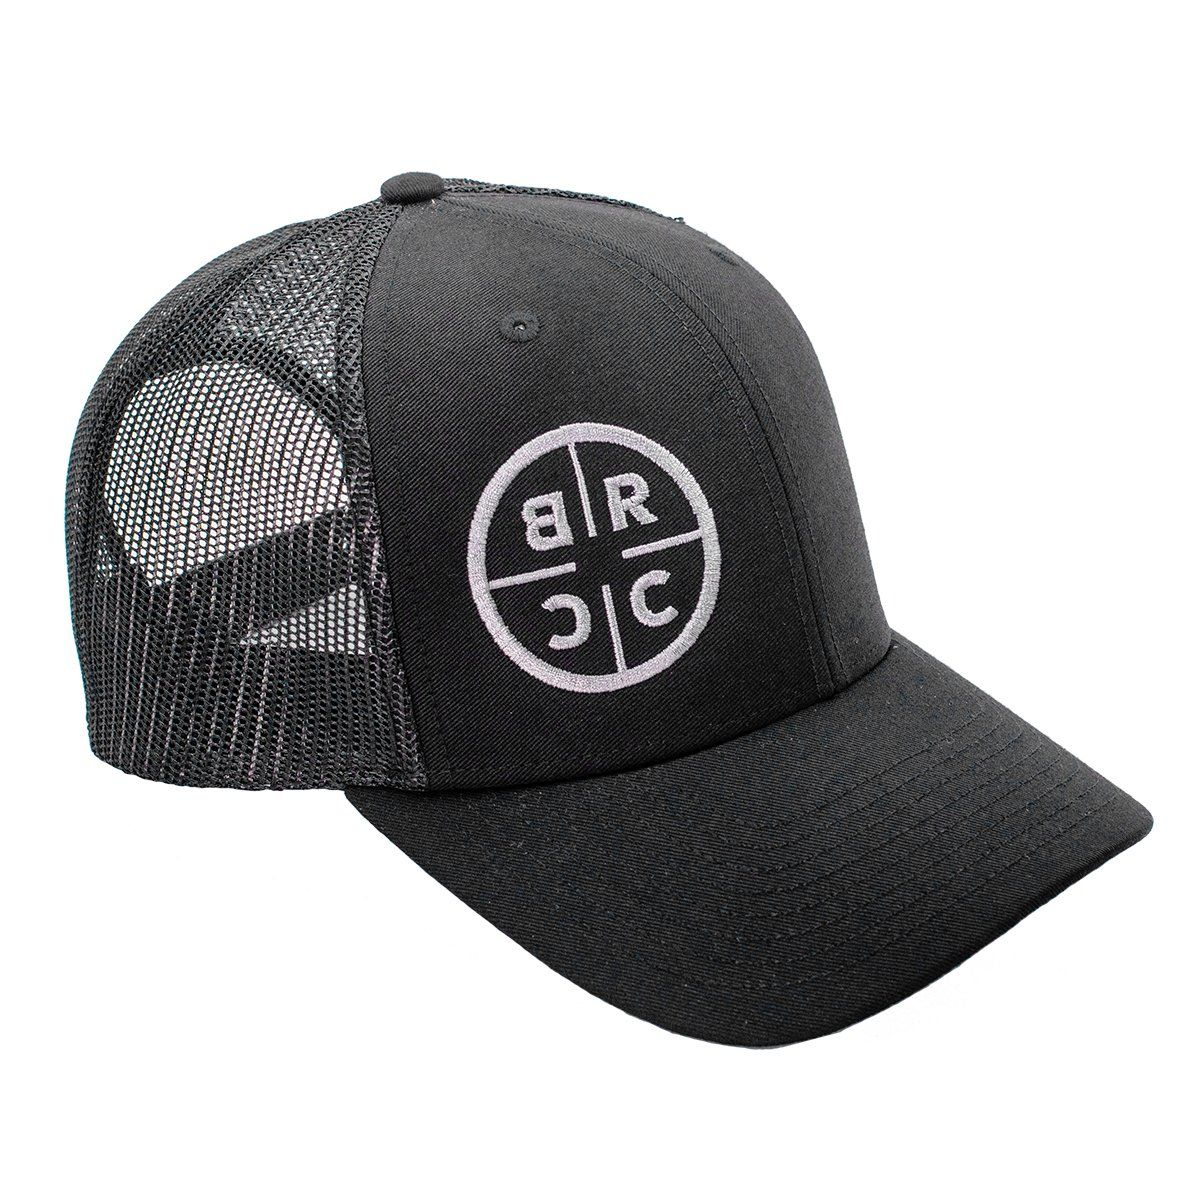 BRCC Circle Logo Trucker Hat Black w/Black Mesh